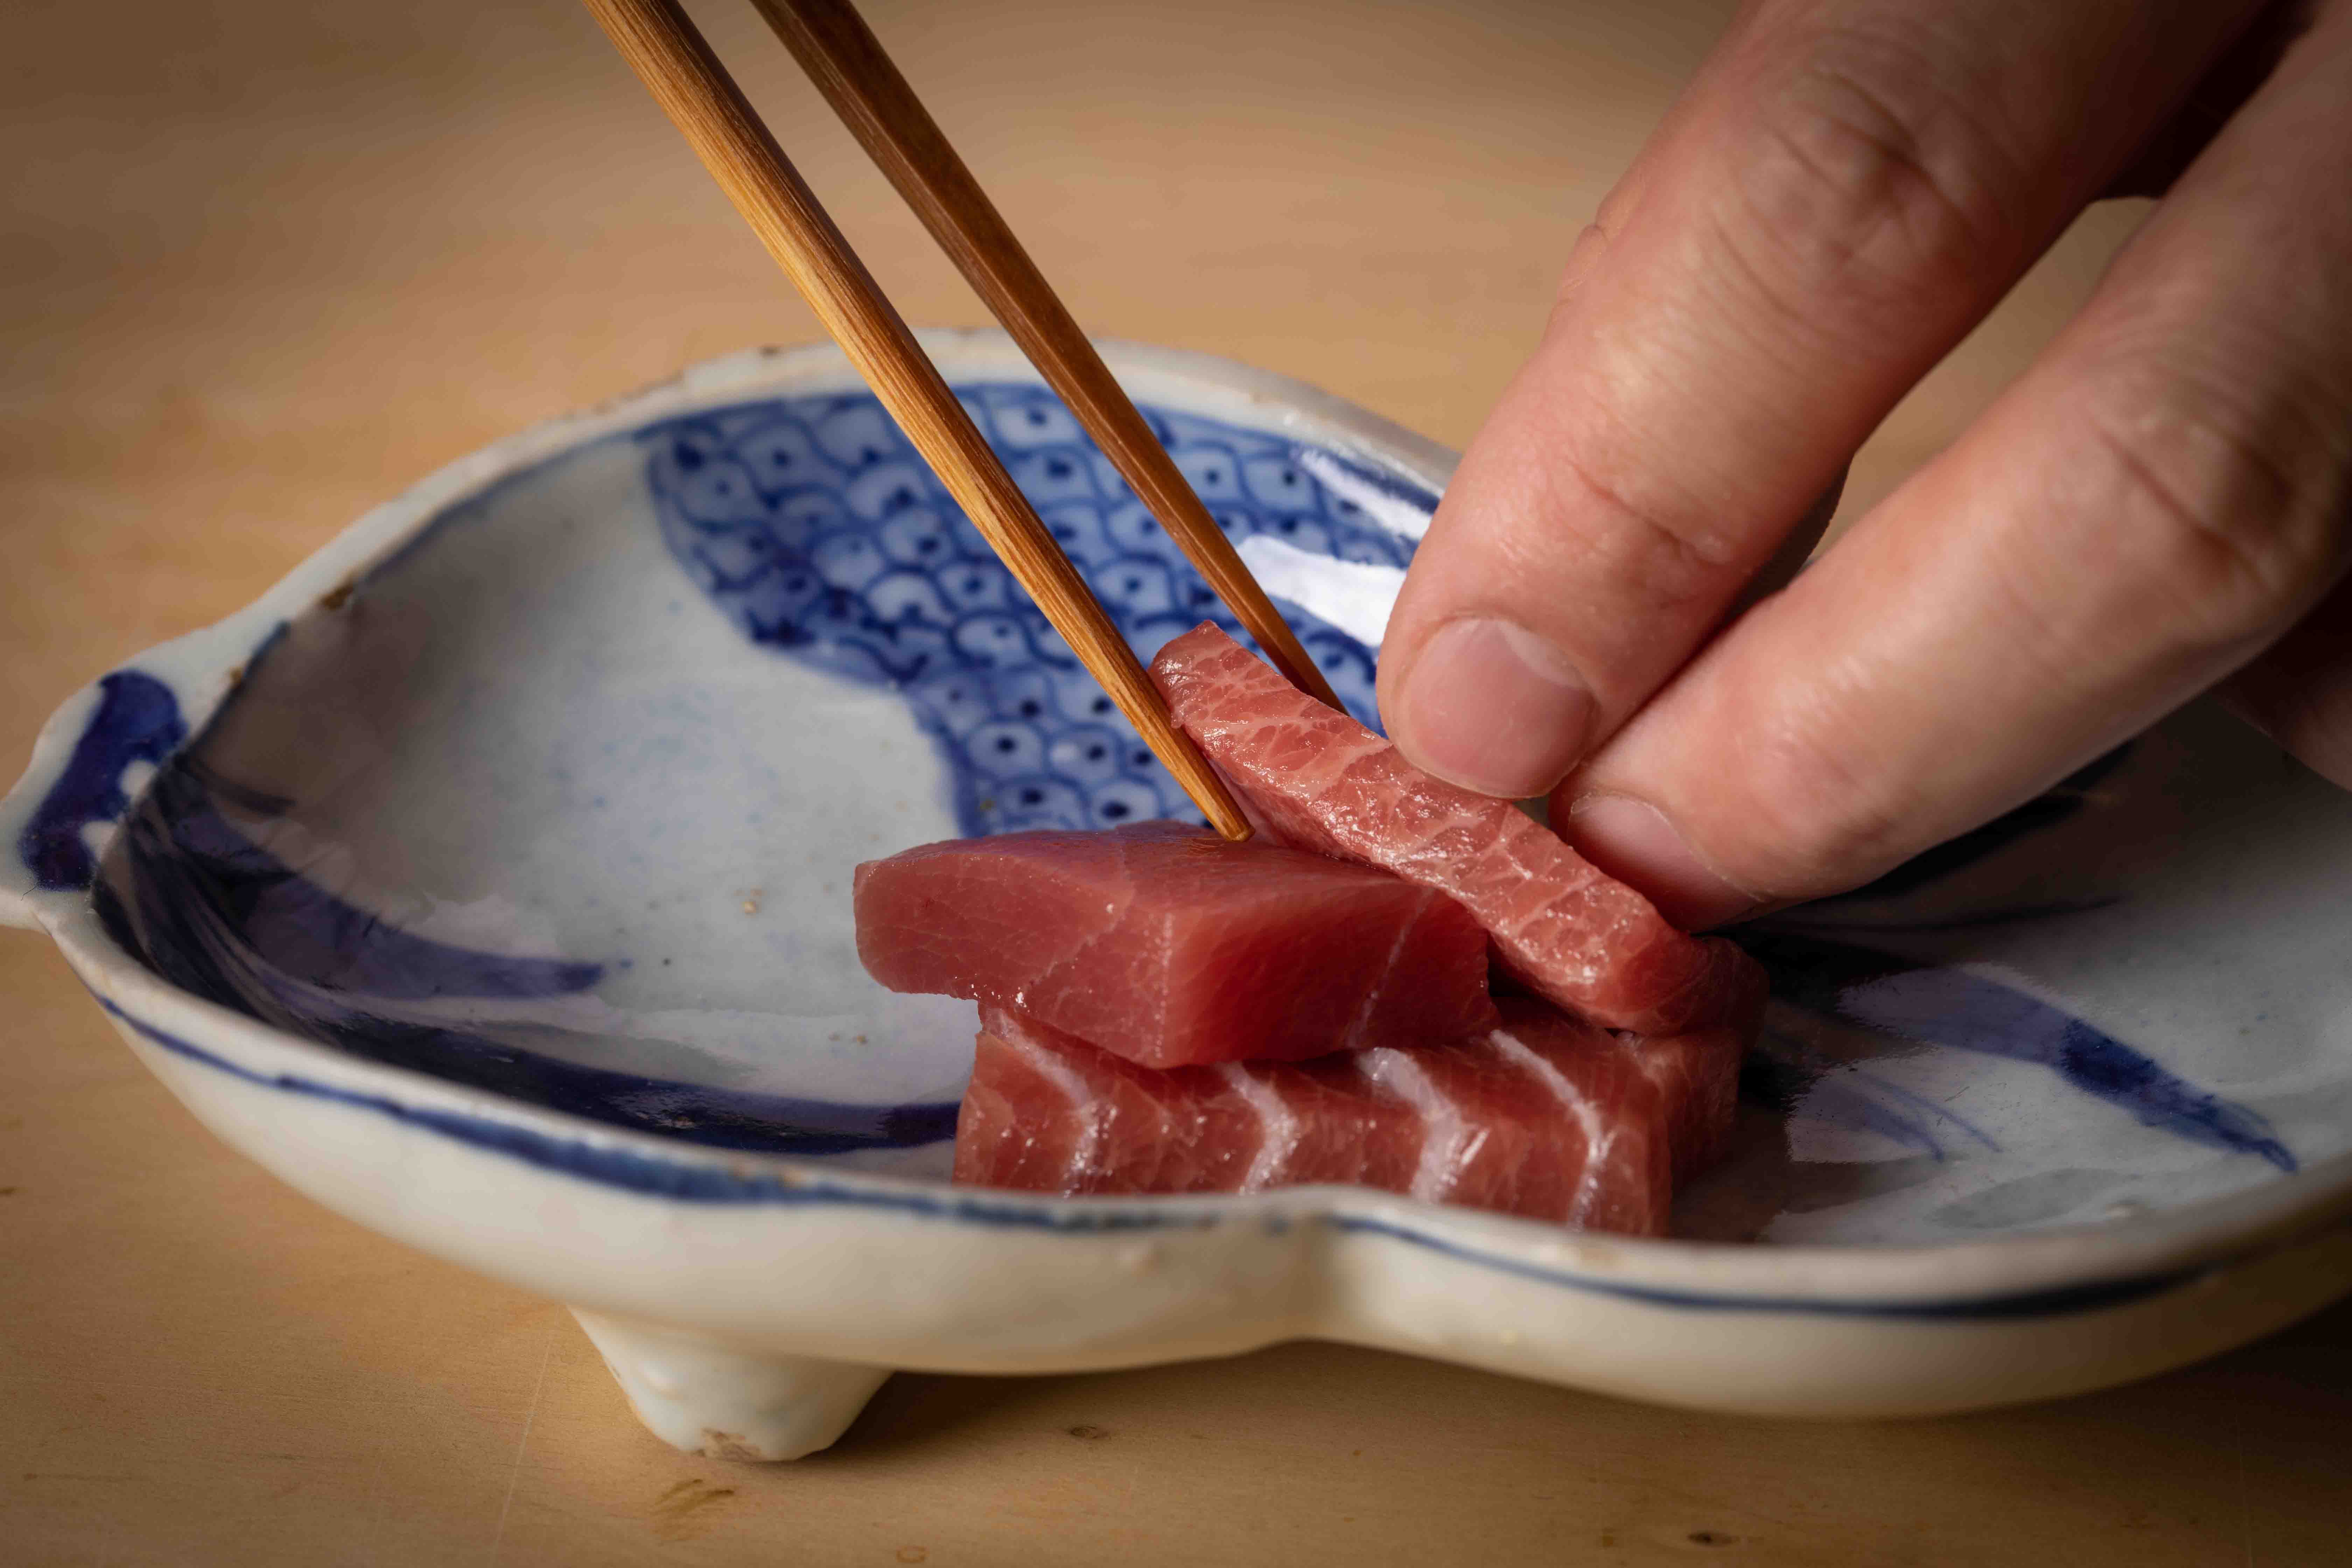 Kataori cuisine #1